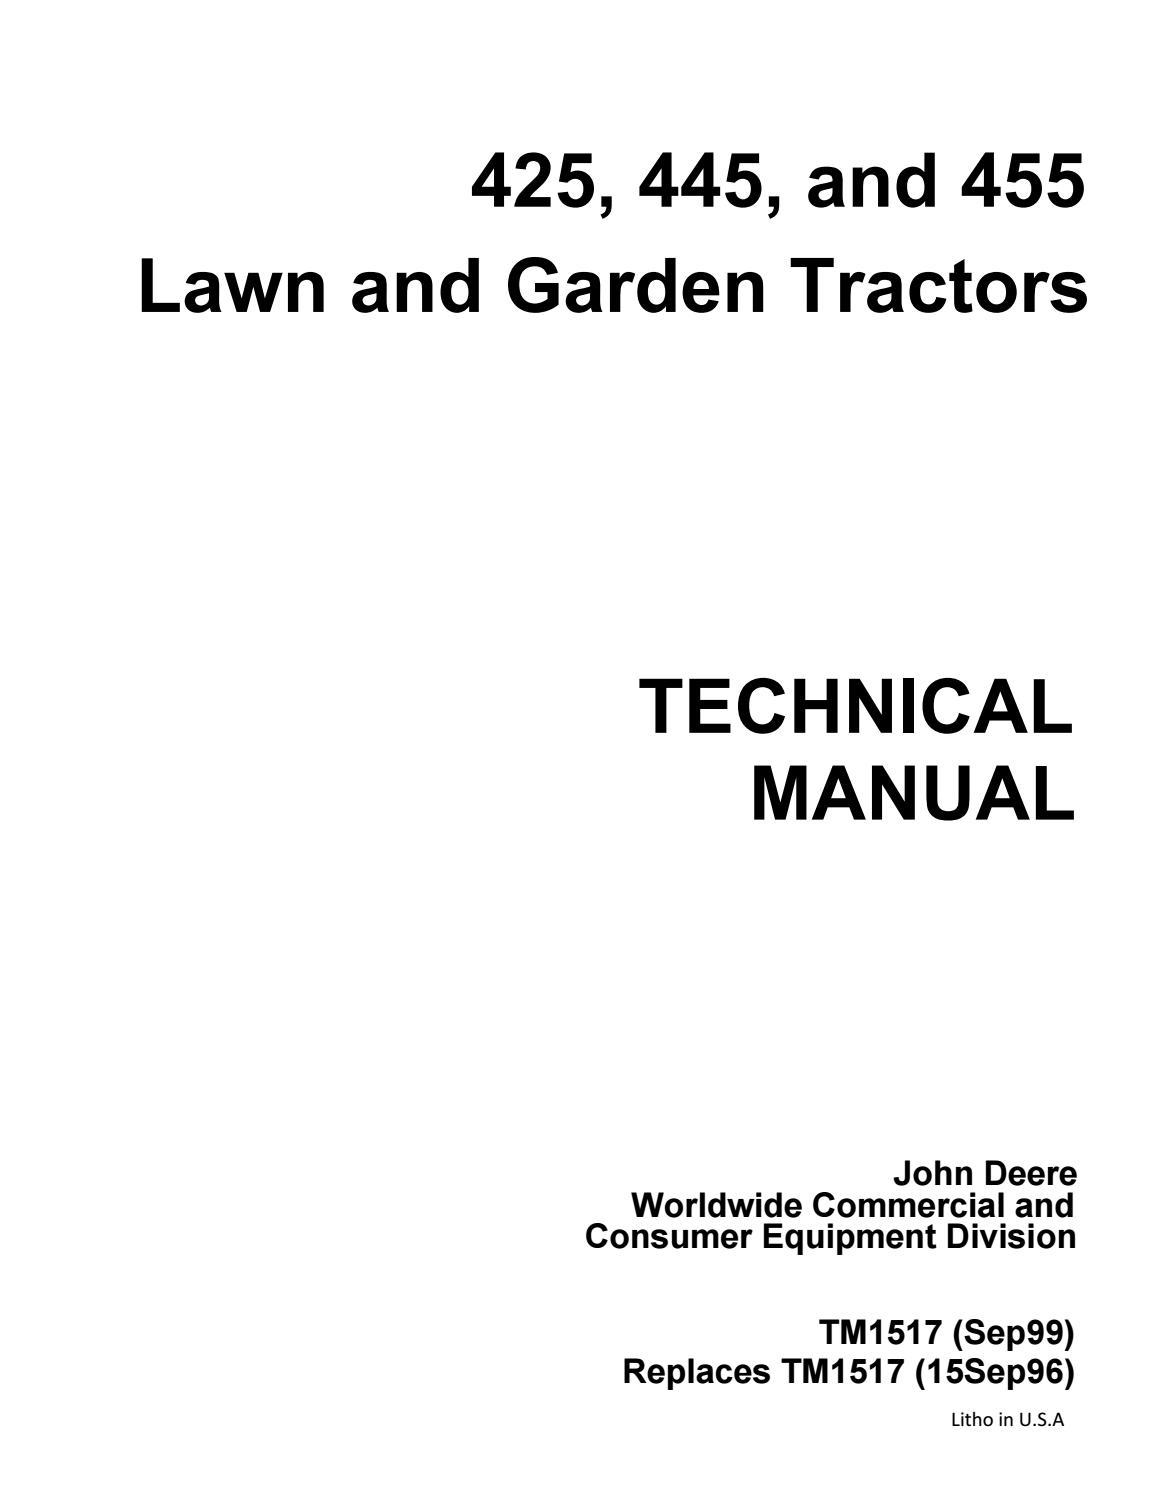 JOHN DEERE 455 LAWN GARDEN TRACTOR Service Repair Manual by 163114103 -  issuuIssuu